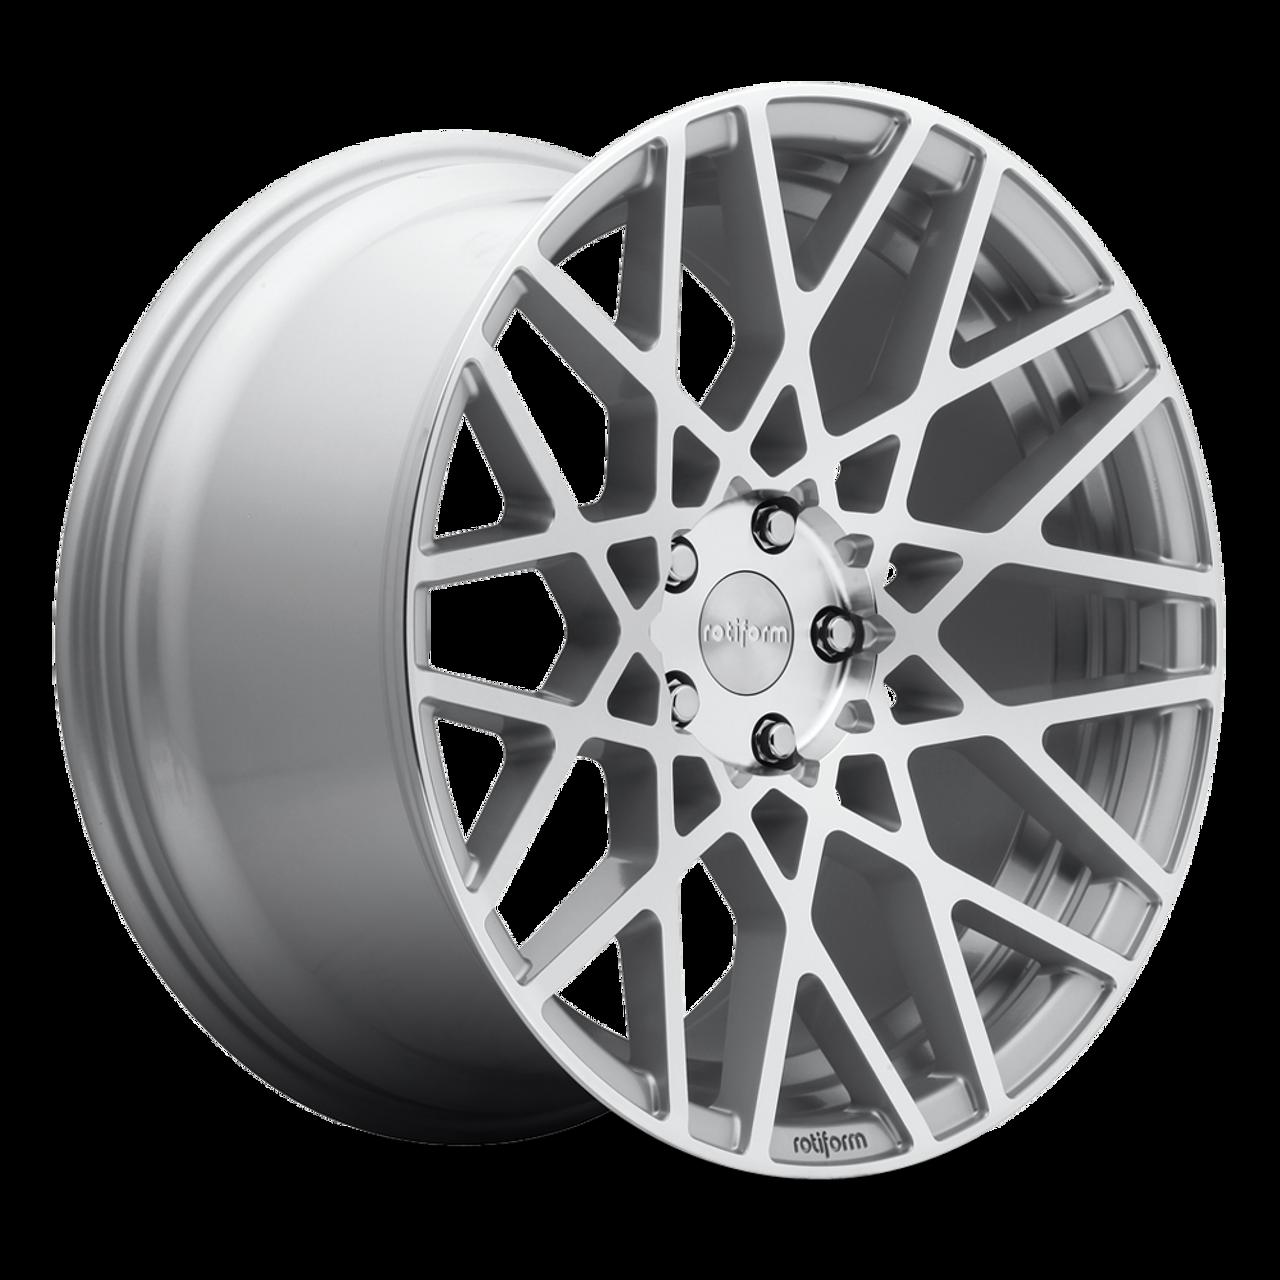 Rotiform BLQ 5x112 - Gloss Silver Machined